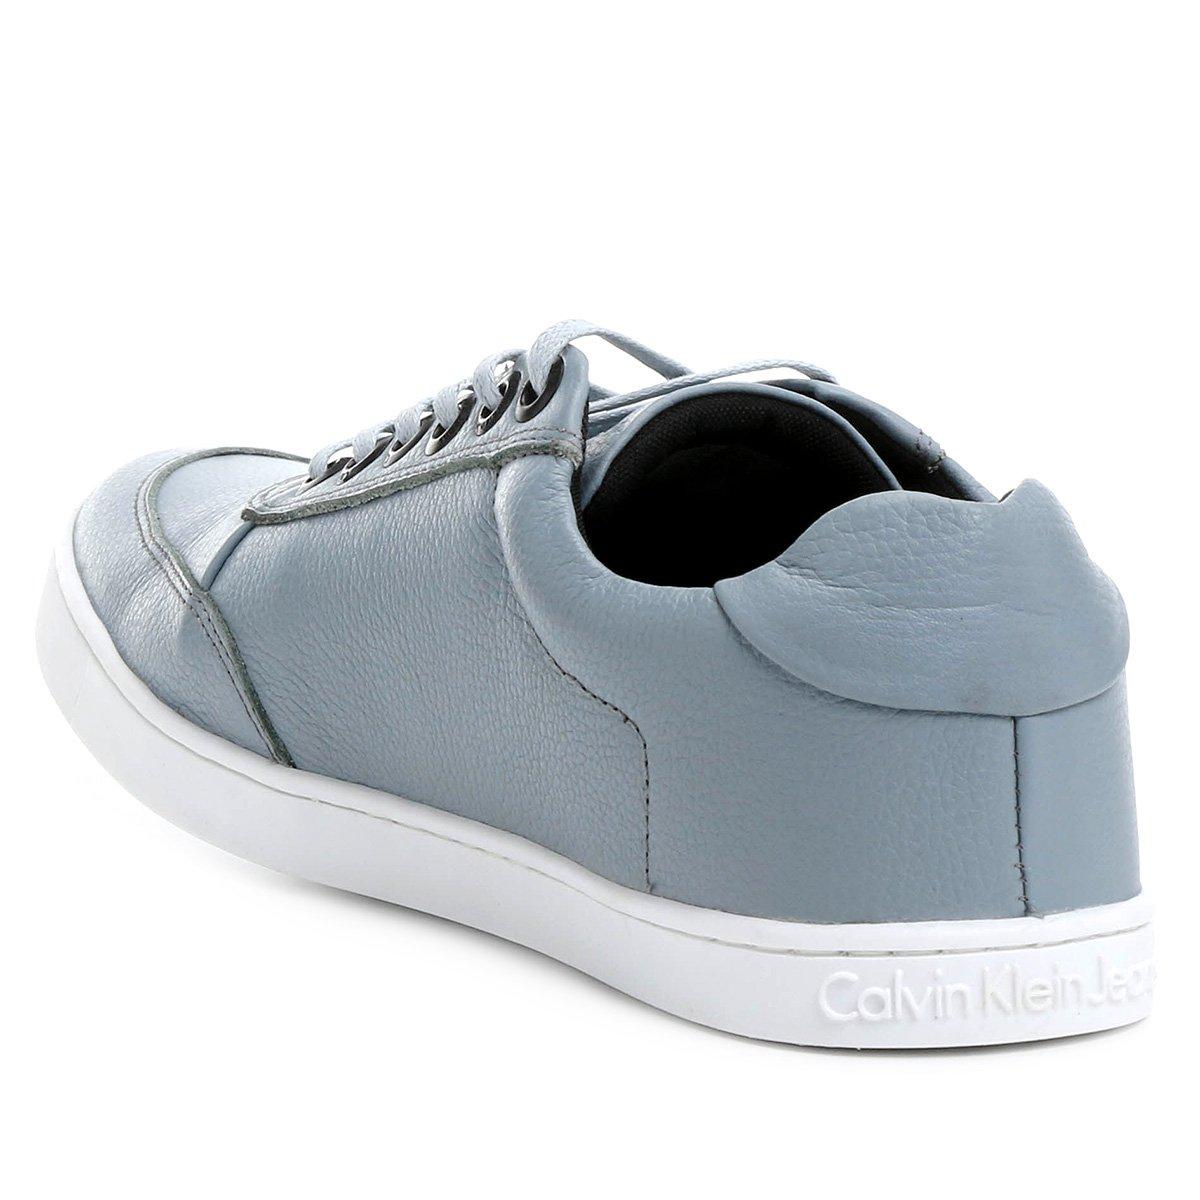 Sapatênis Couro Calvin Klein Boat Lth Masculino - Azul - Compre ... b02031d349